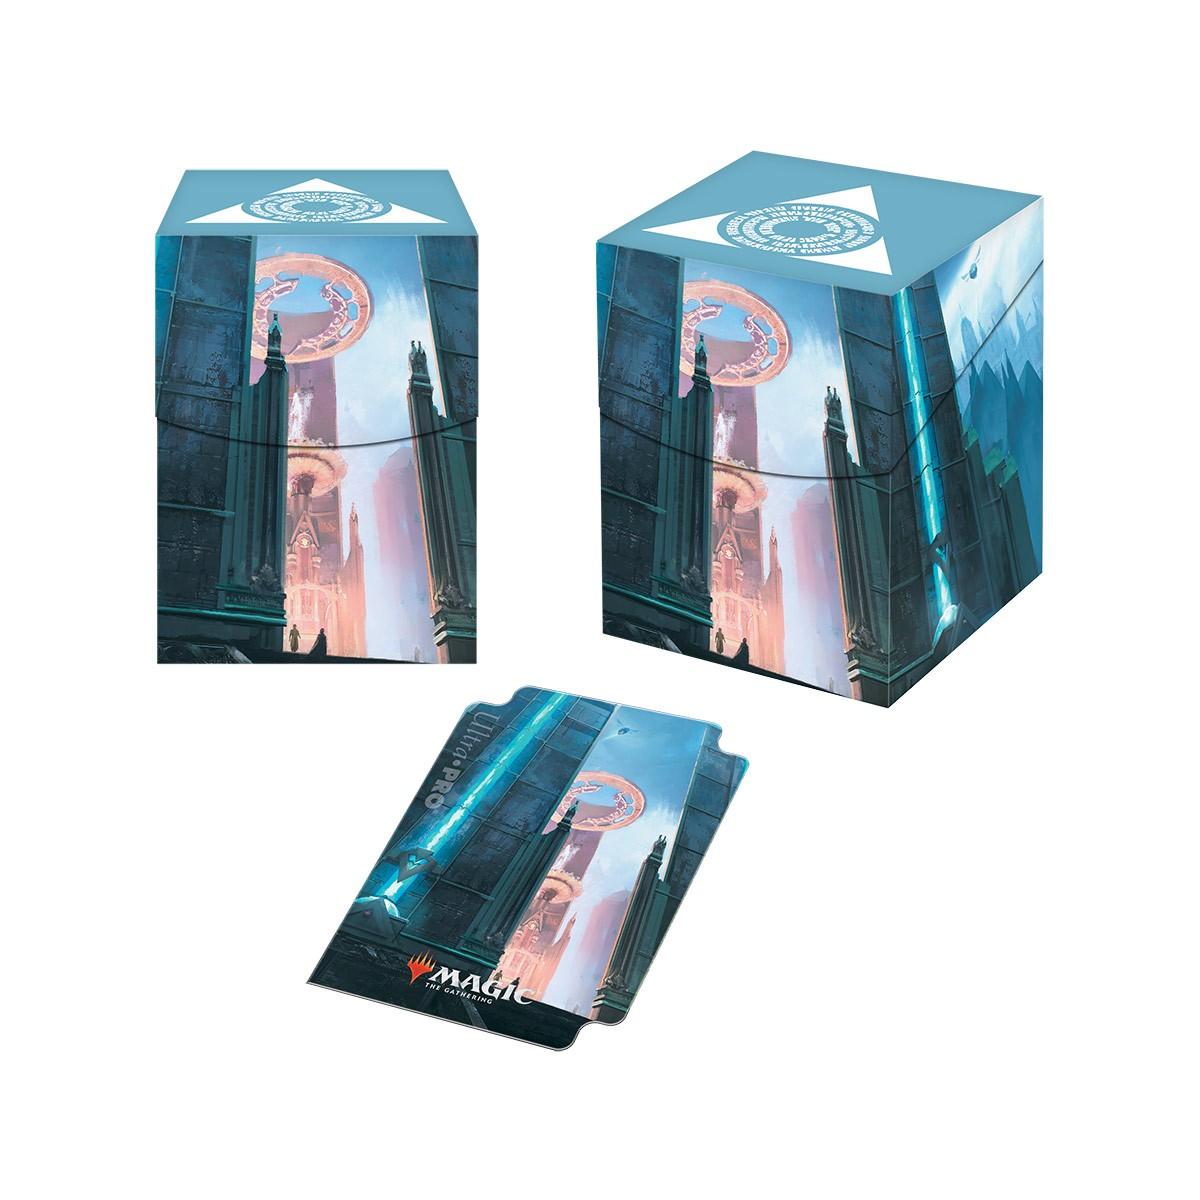 Deck Box Pro 100 Guilds Of Ravnica Azorius Senate Ultra Pro Standard orzhov control decks from the best players around the world. la citadelle des jeux